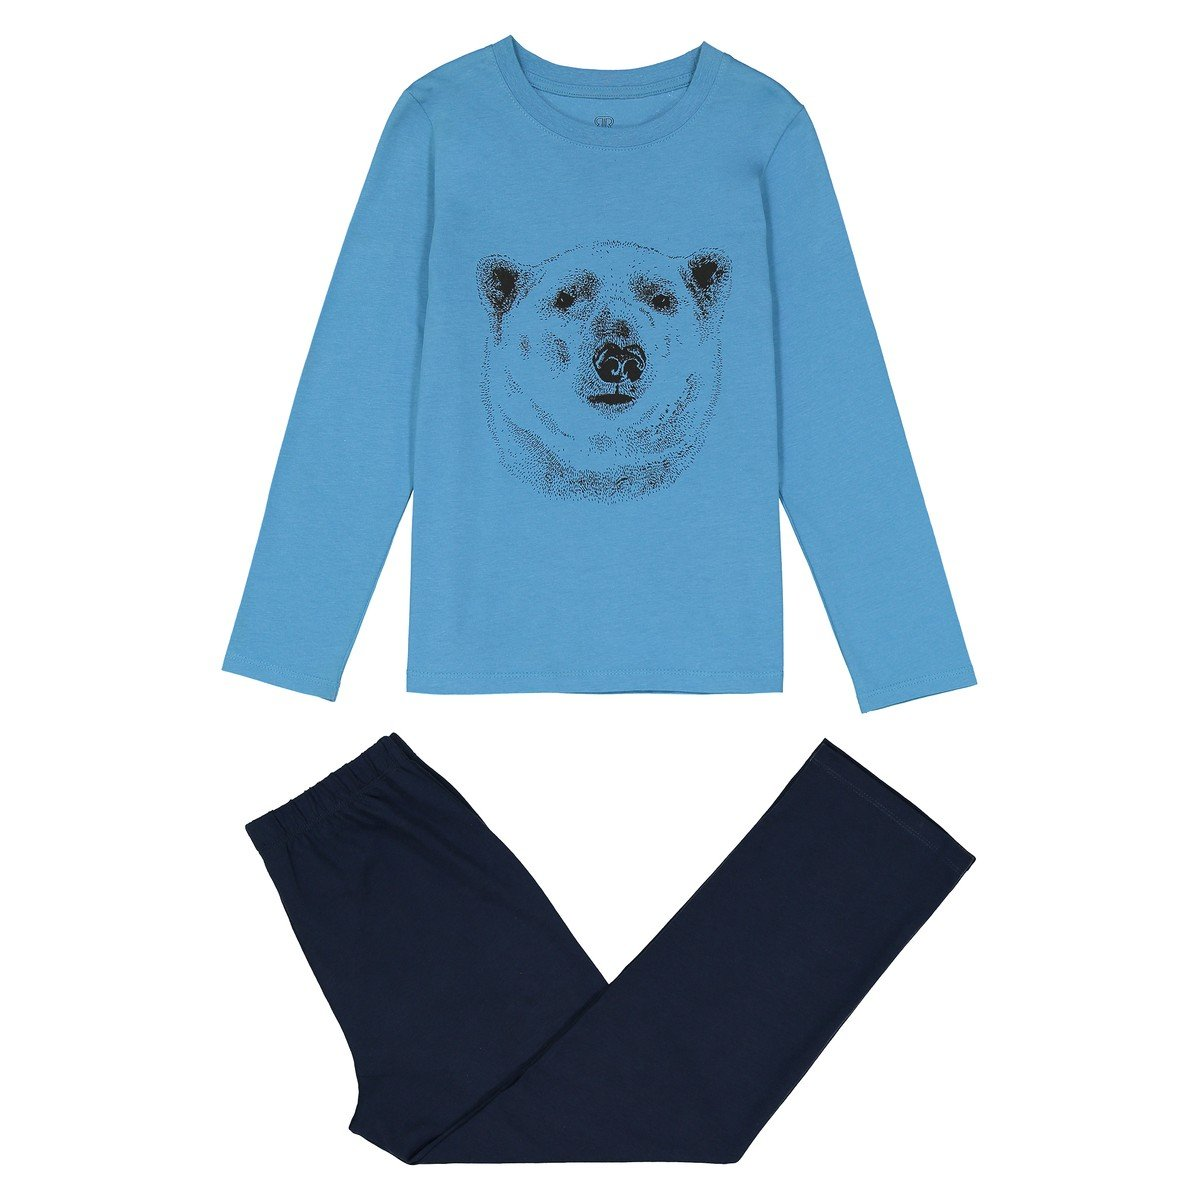 3-12 Years La Redoute Collections Big Boys Two-Tone Cotton Pyjamas